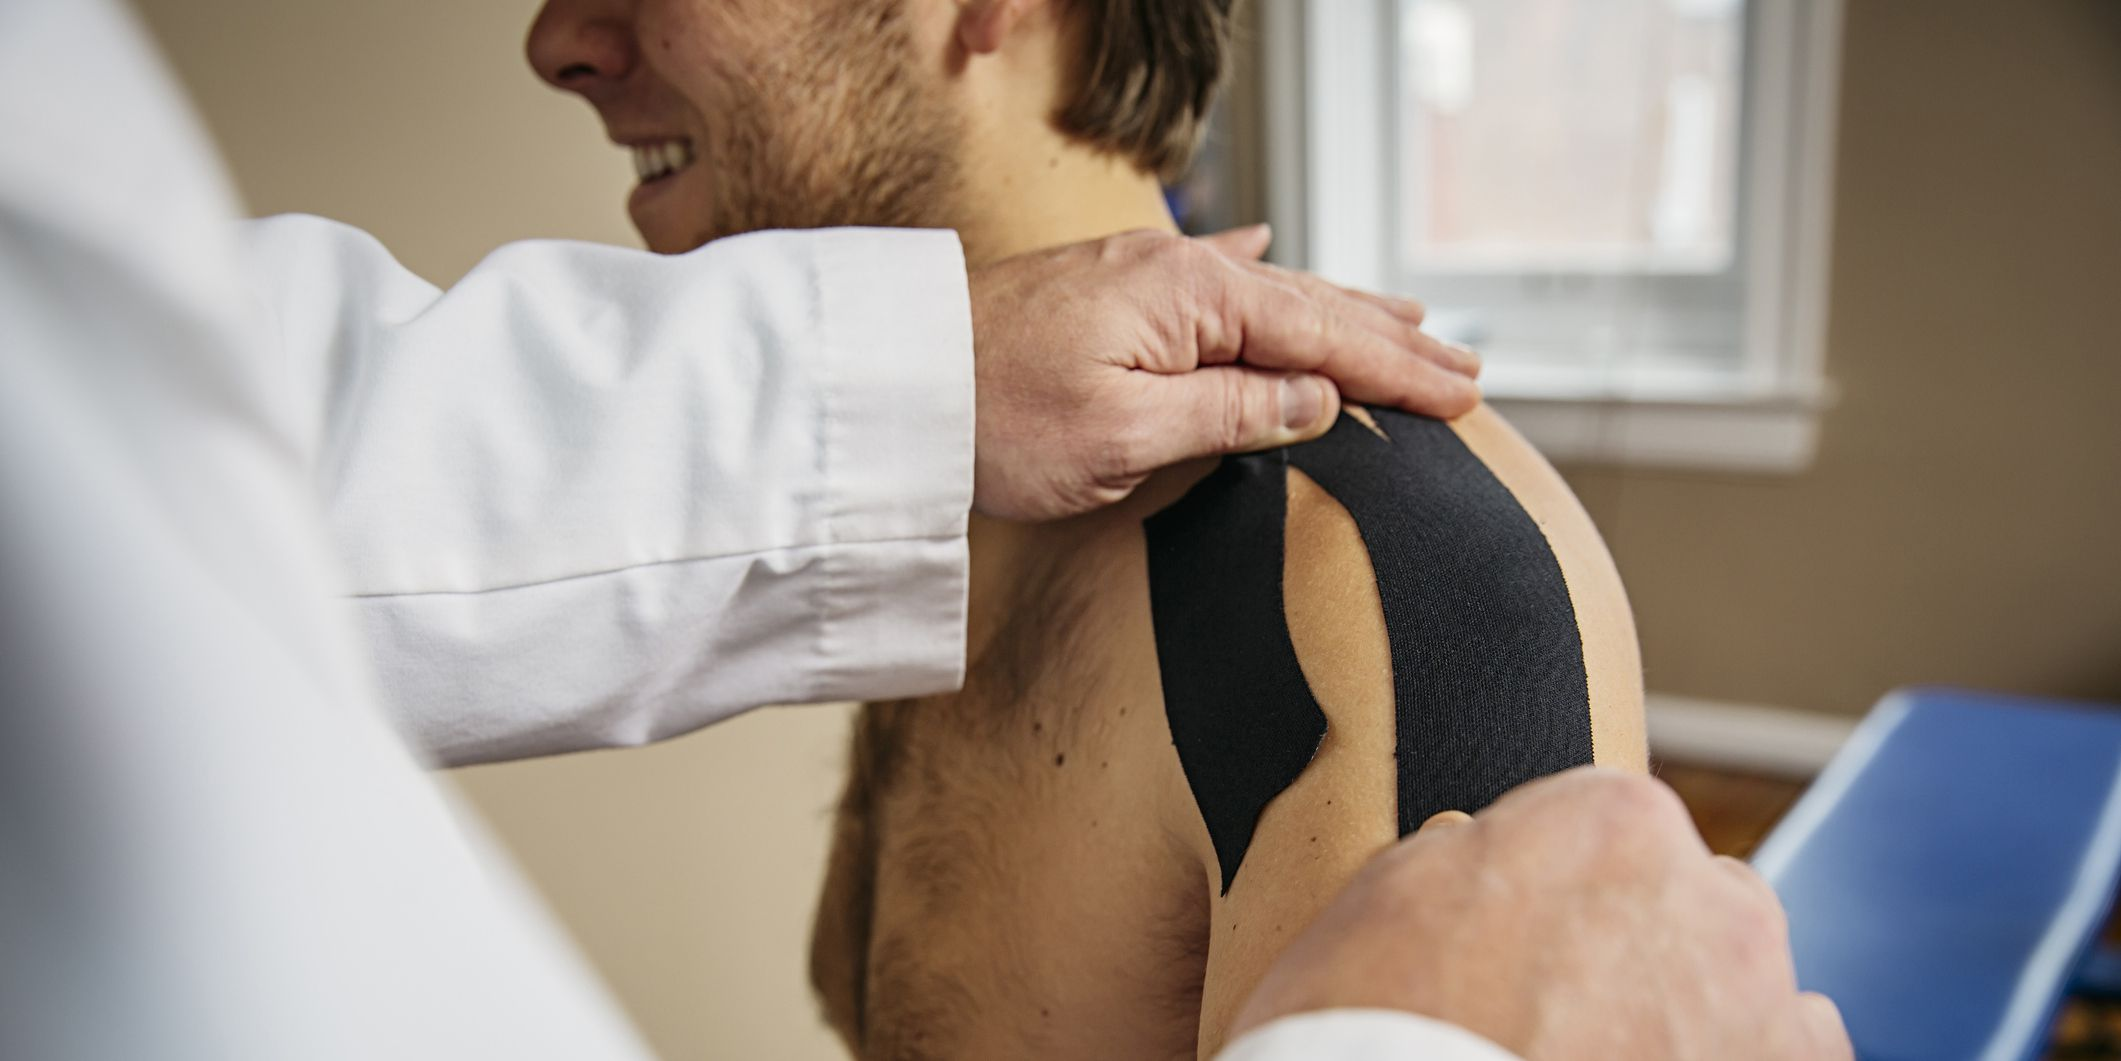 Orthopedist applying shoulder tape